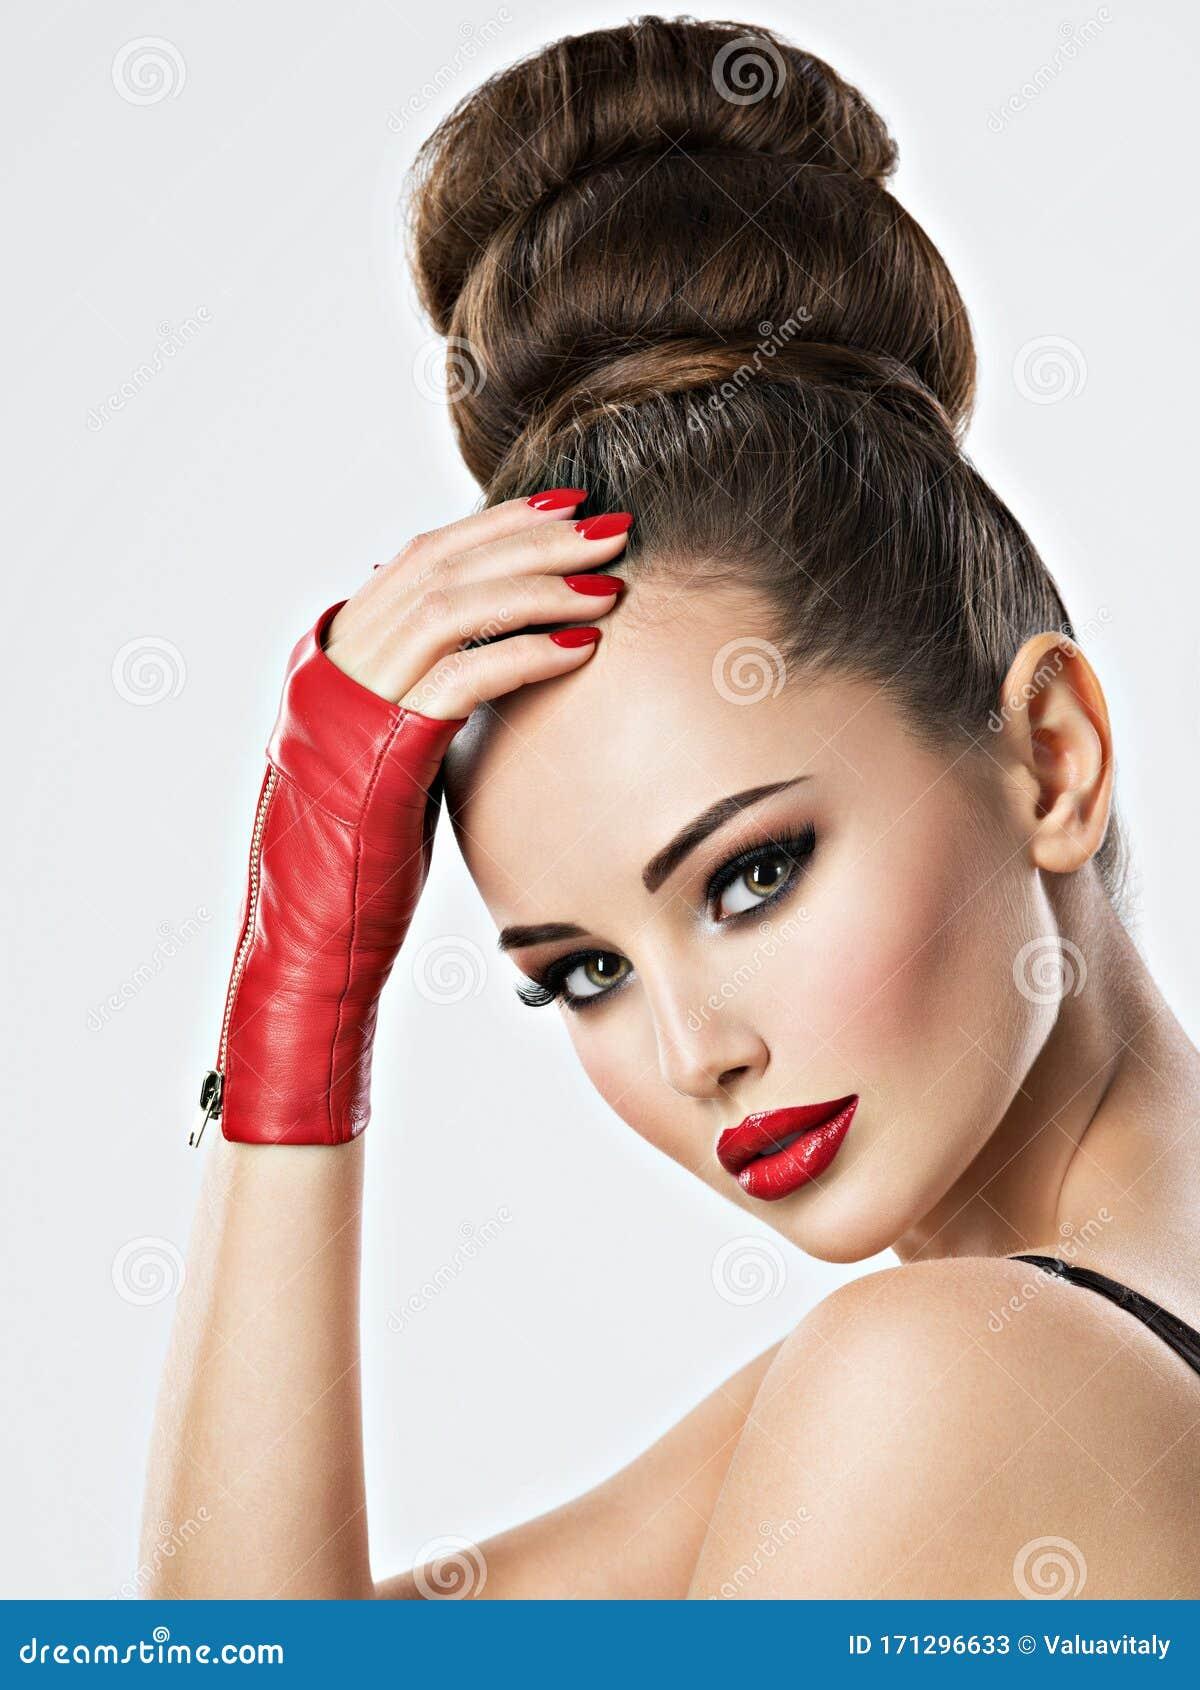 adult glamour model